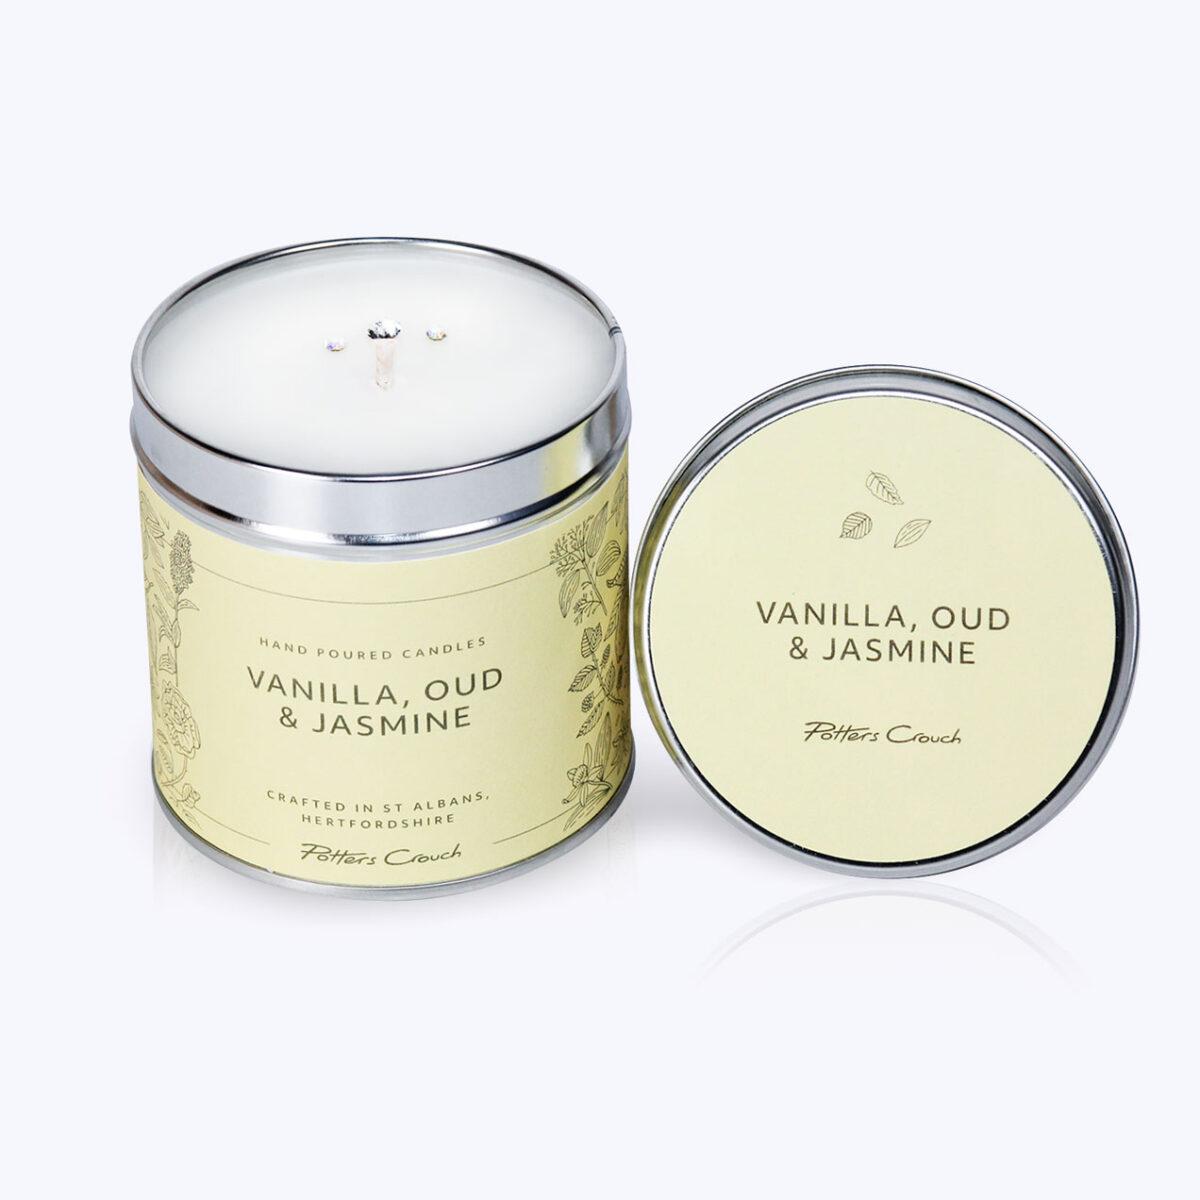 Vanilla, Oud & Jasmine Wellness Candle – For A Sense Of Calm